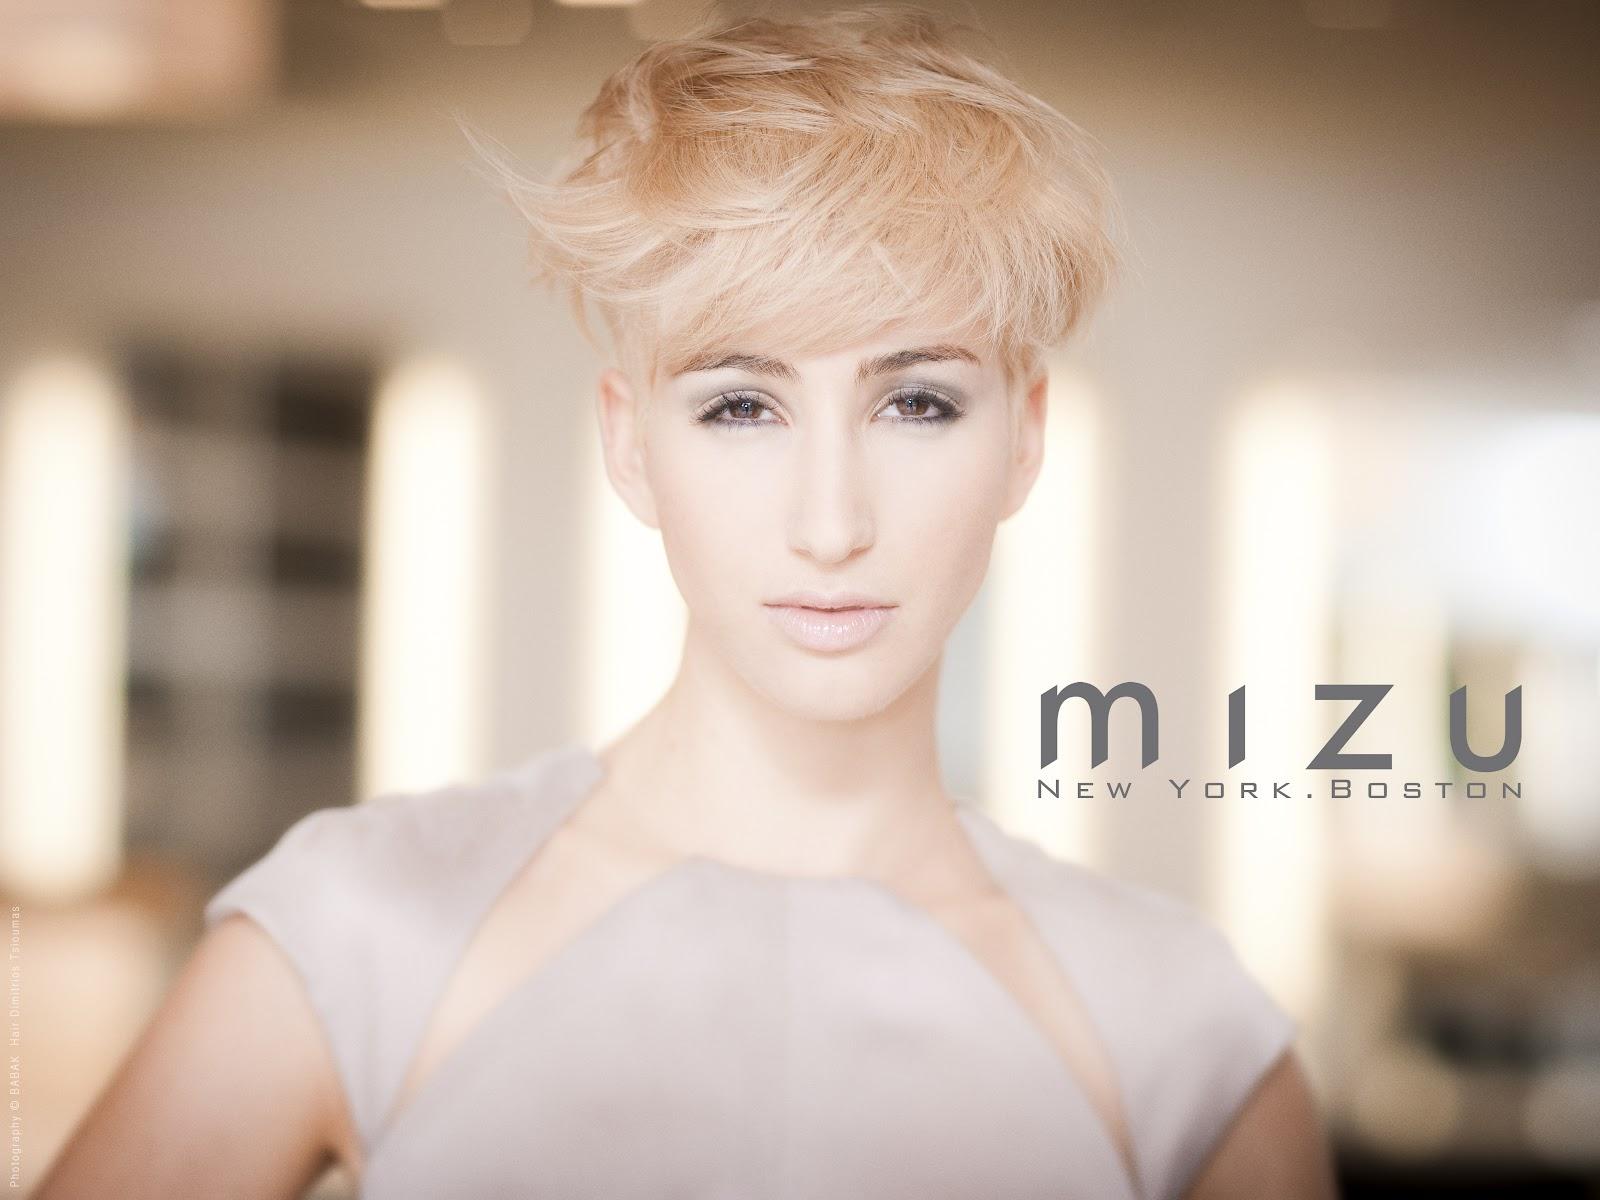 Spf hair trends blushing yet fashion hair style for Mizu hair salon nyc